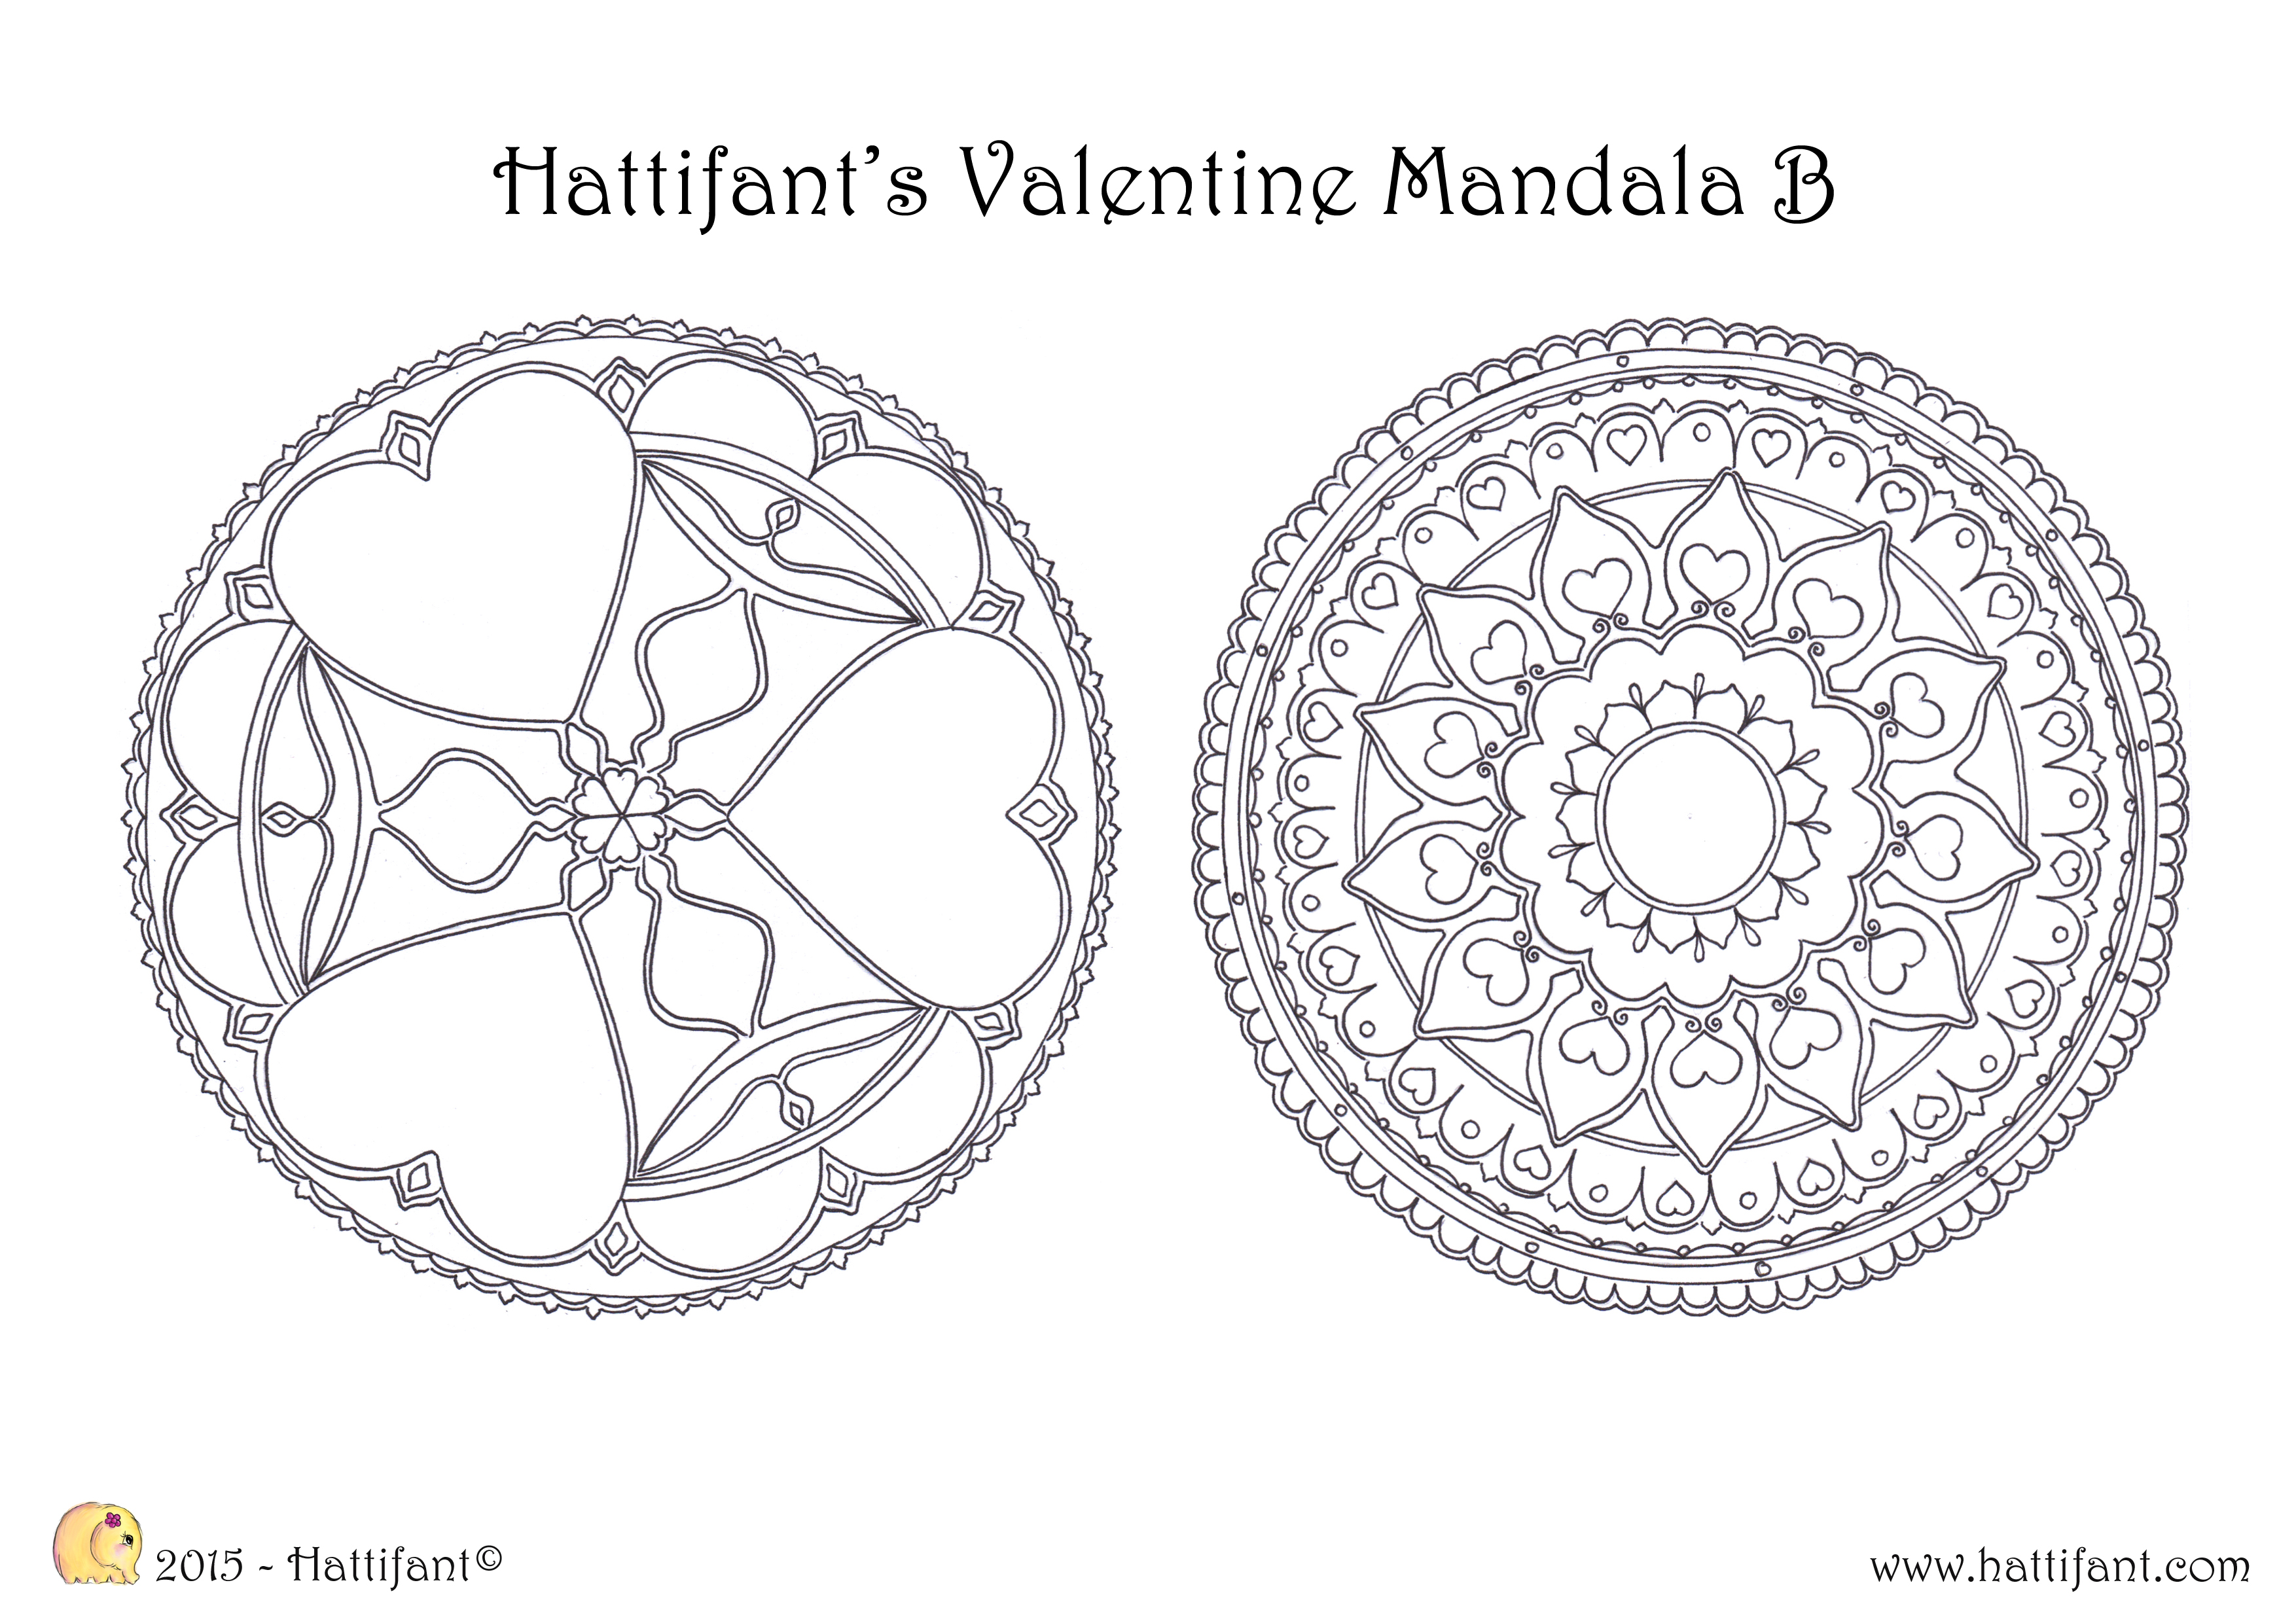 Hattifant ValentineMandala A B